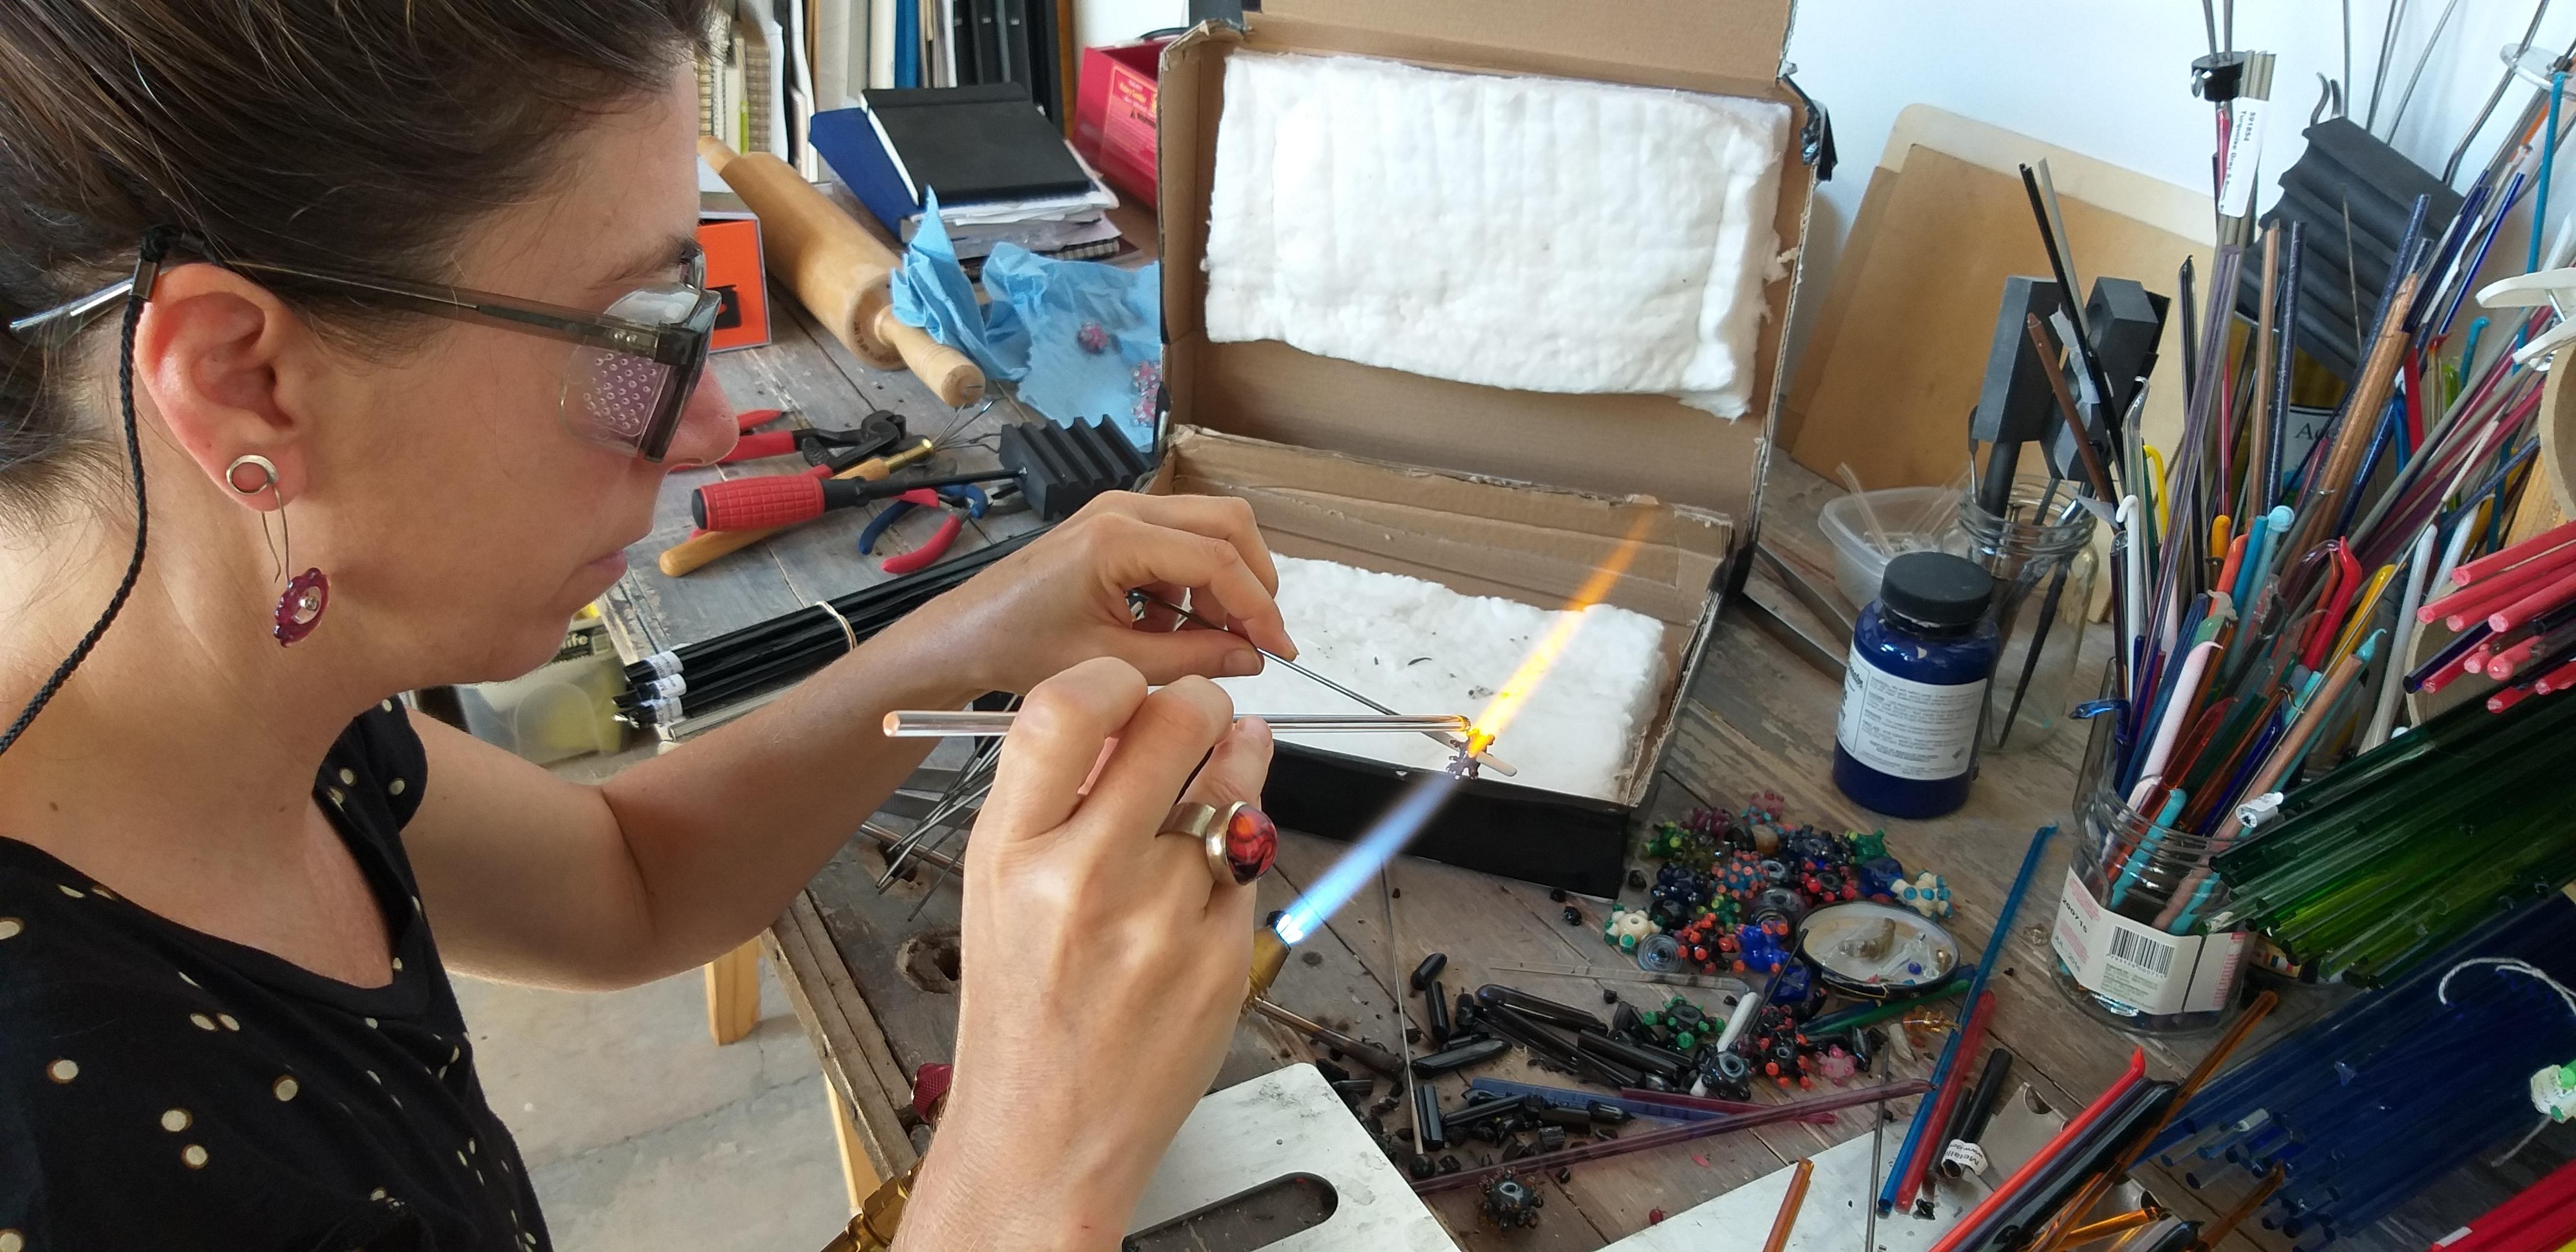 Cecilia Lopez-Bravo working in her studio (image courtesy of the artist)